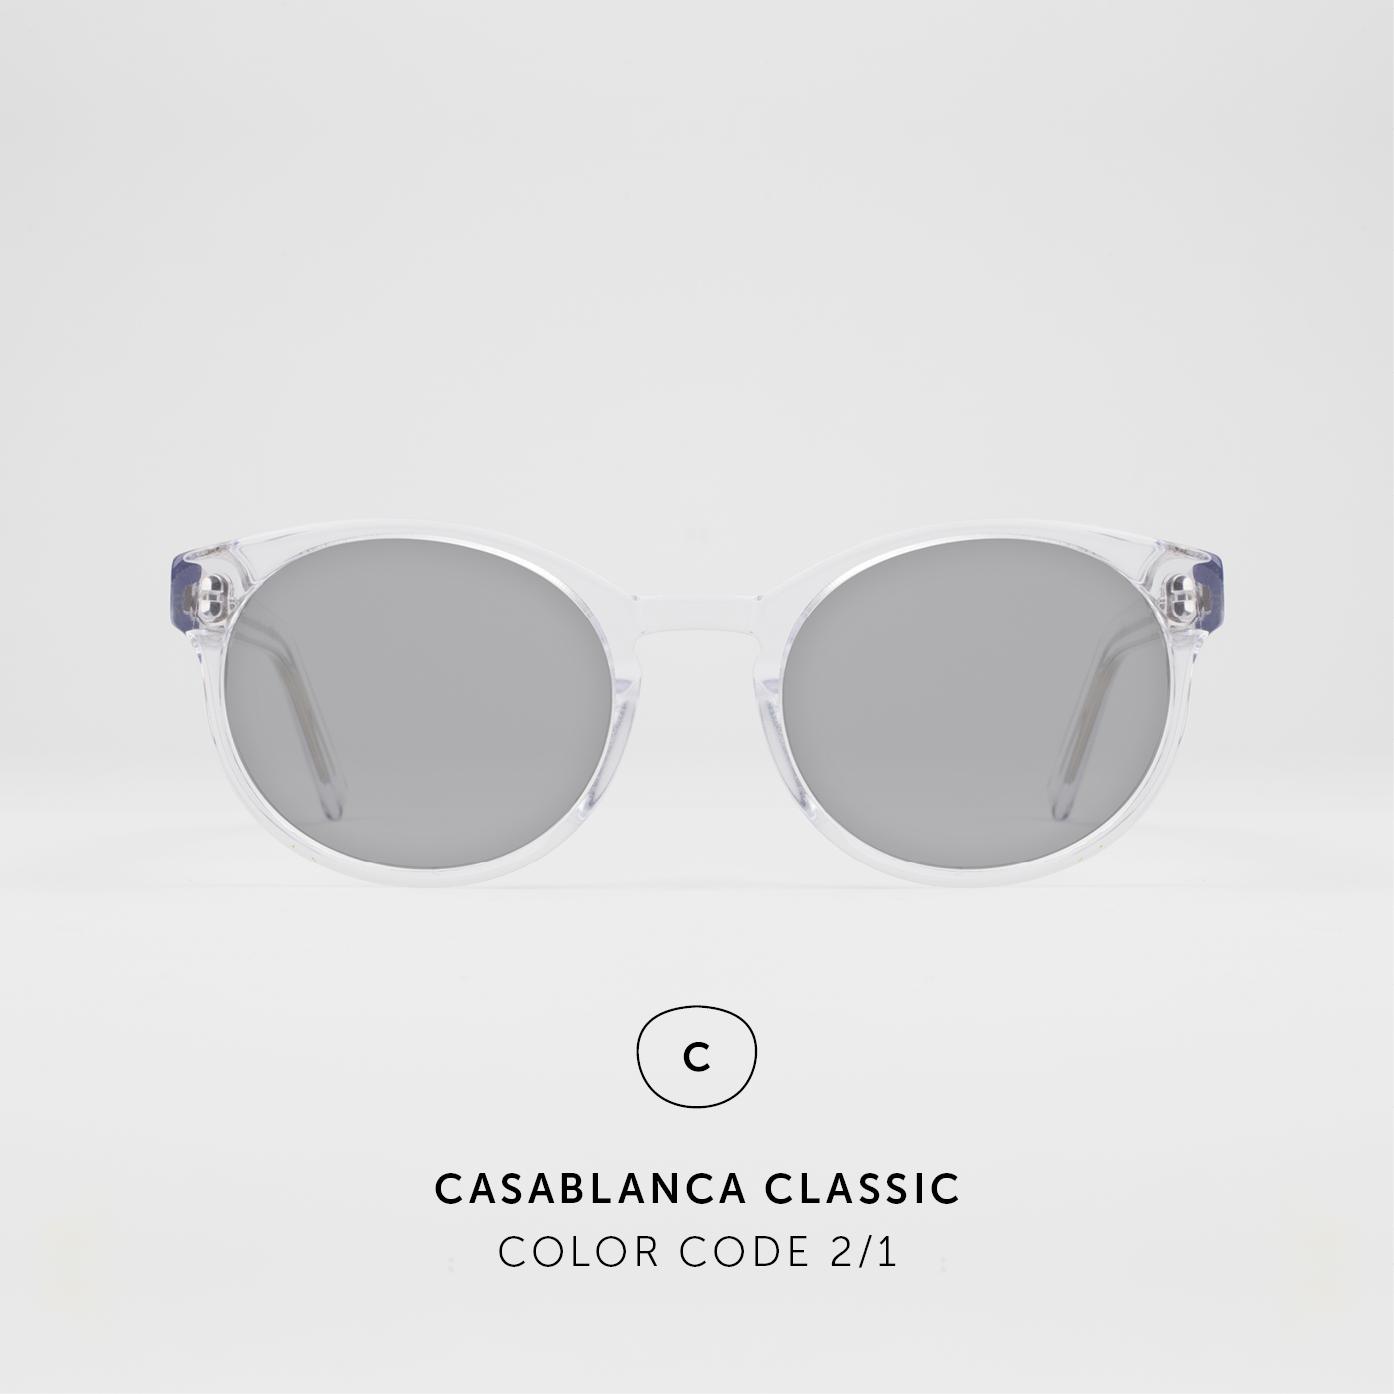 CasablancaClassic15.jpg